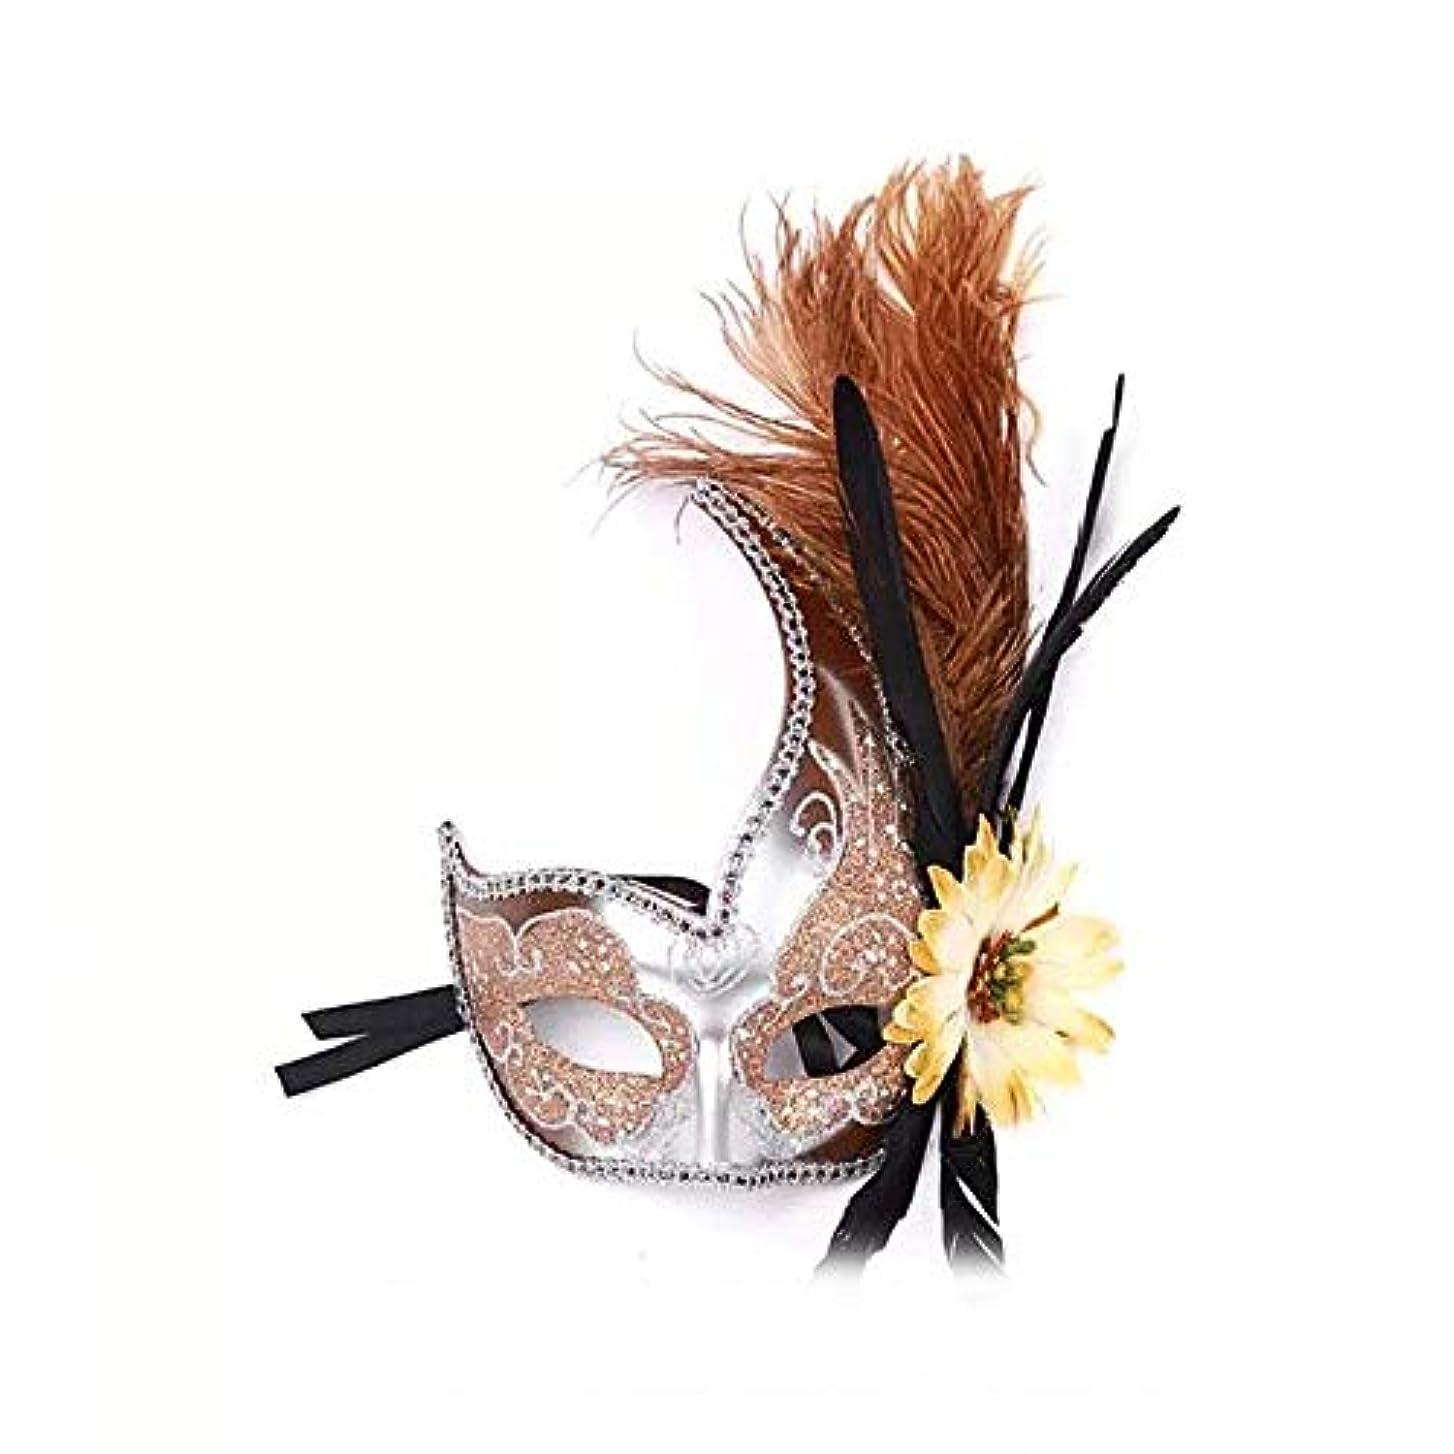 Nanle ハロウィンマスクハーフフェザーマスクベニスプリンセスマスク美容レース仮面ライダーコスプレ (色 : Style B orange)